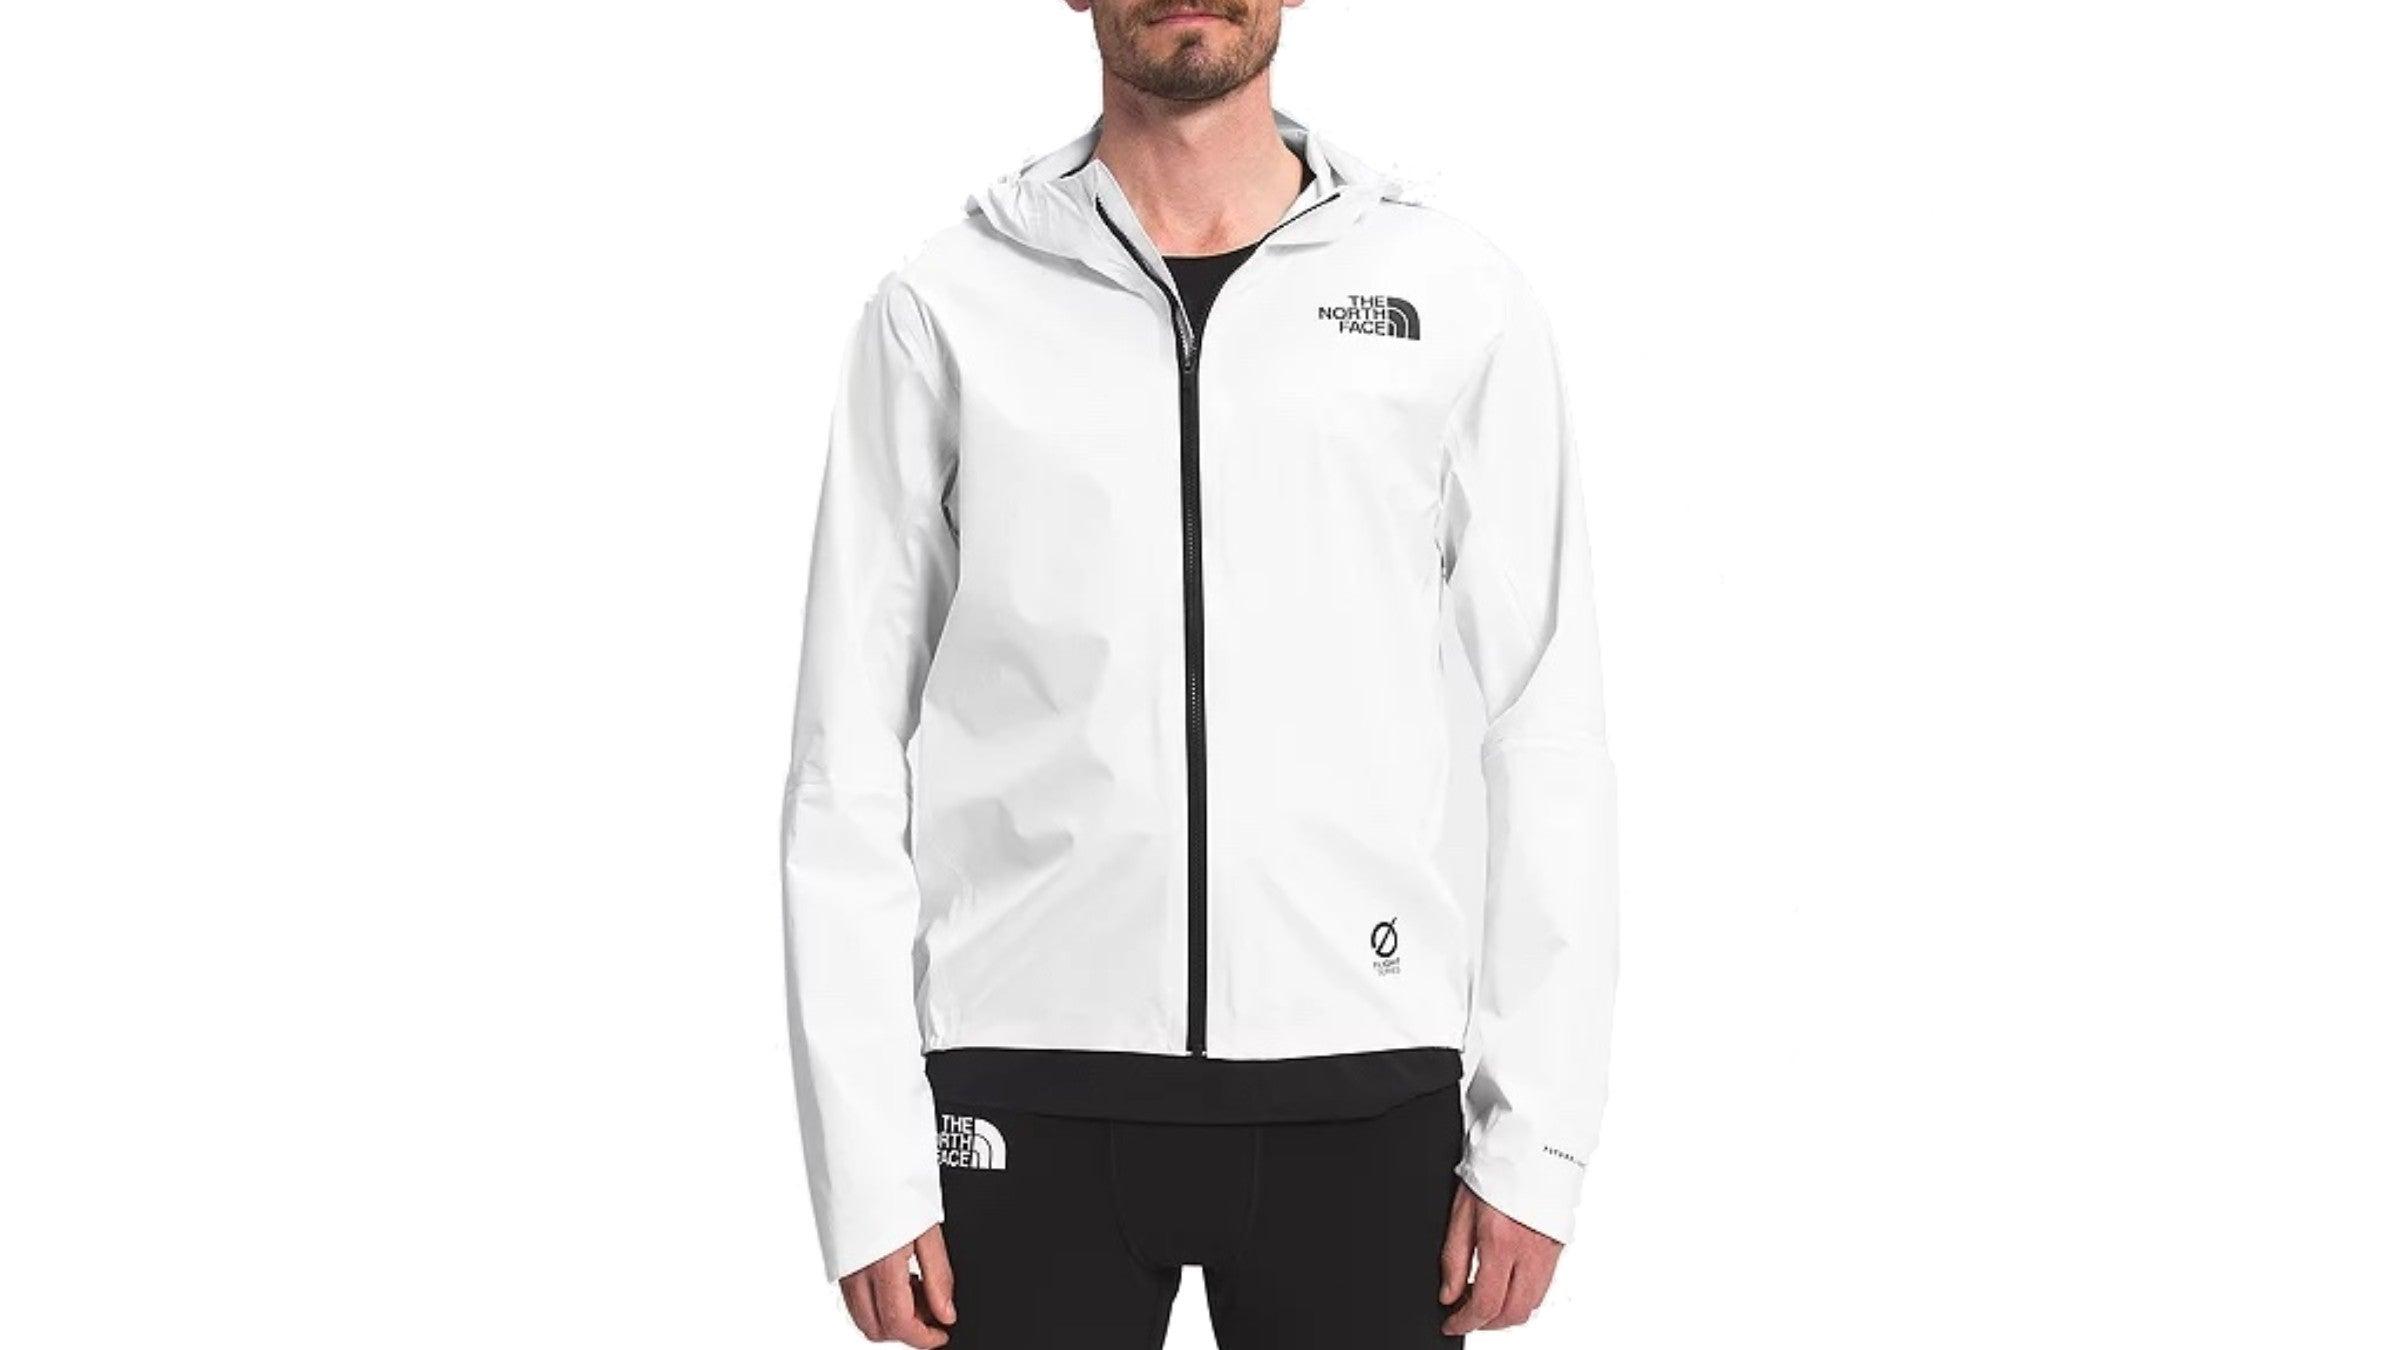 Men's The North Face Lightriser Futurelight jacket